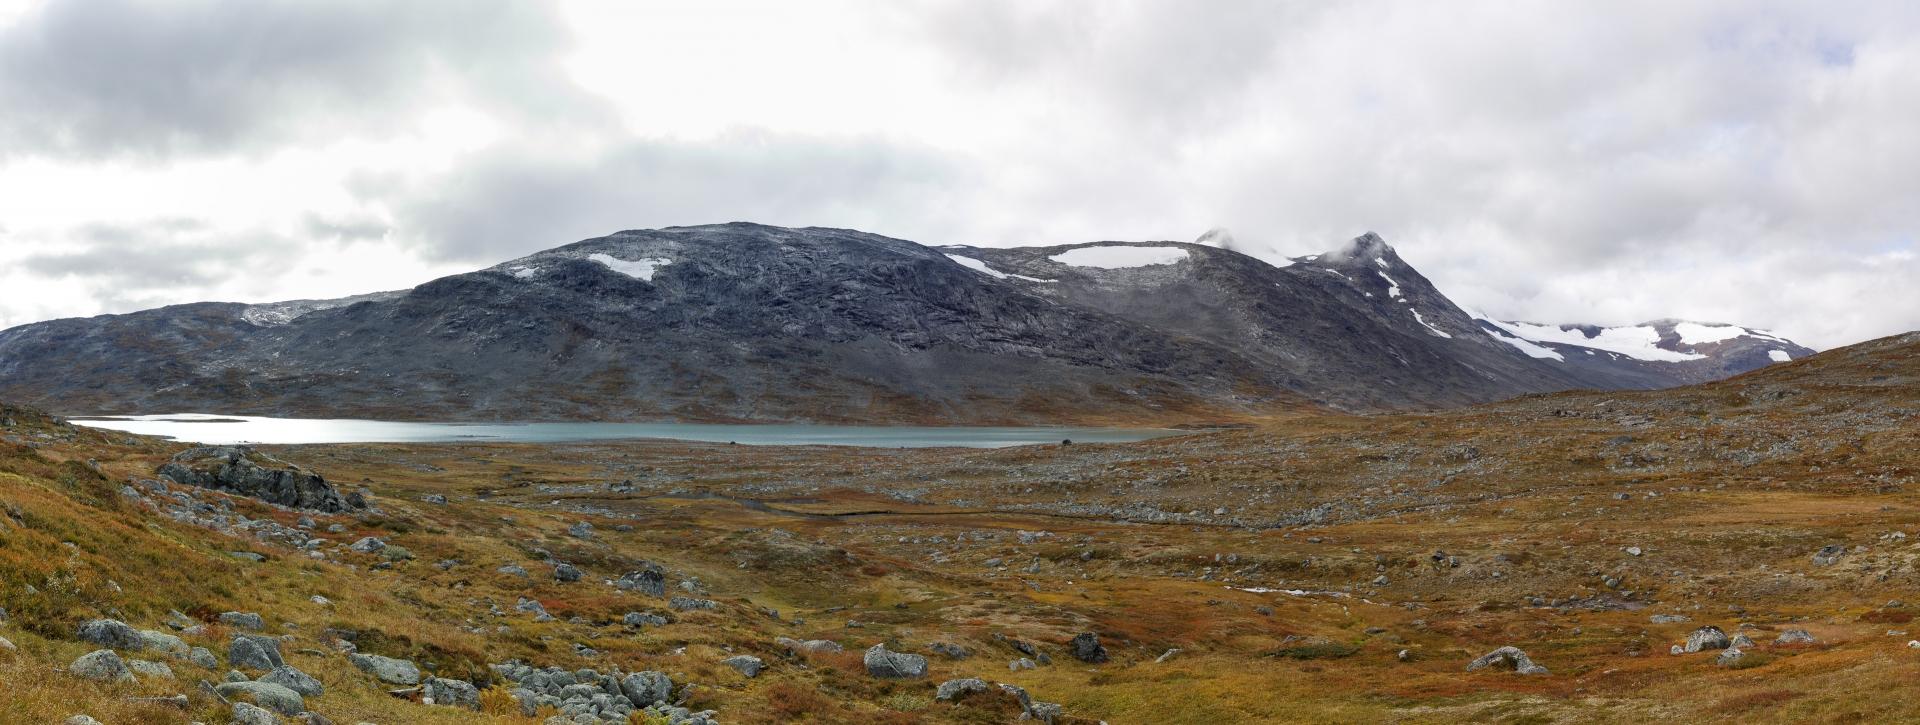 Blick aus dem Oallavággi zurück auf den Sealggajávri und dahinter das Storsteinsfjellet mit dem Sealggajiekna